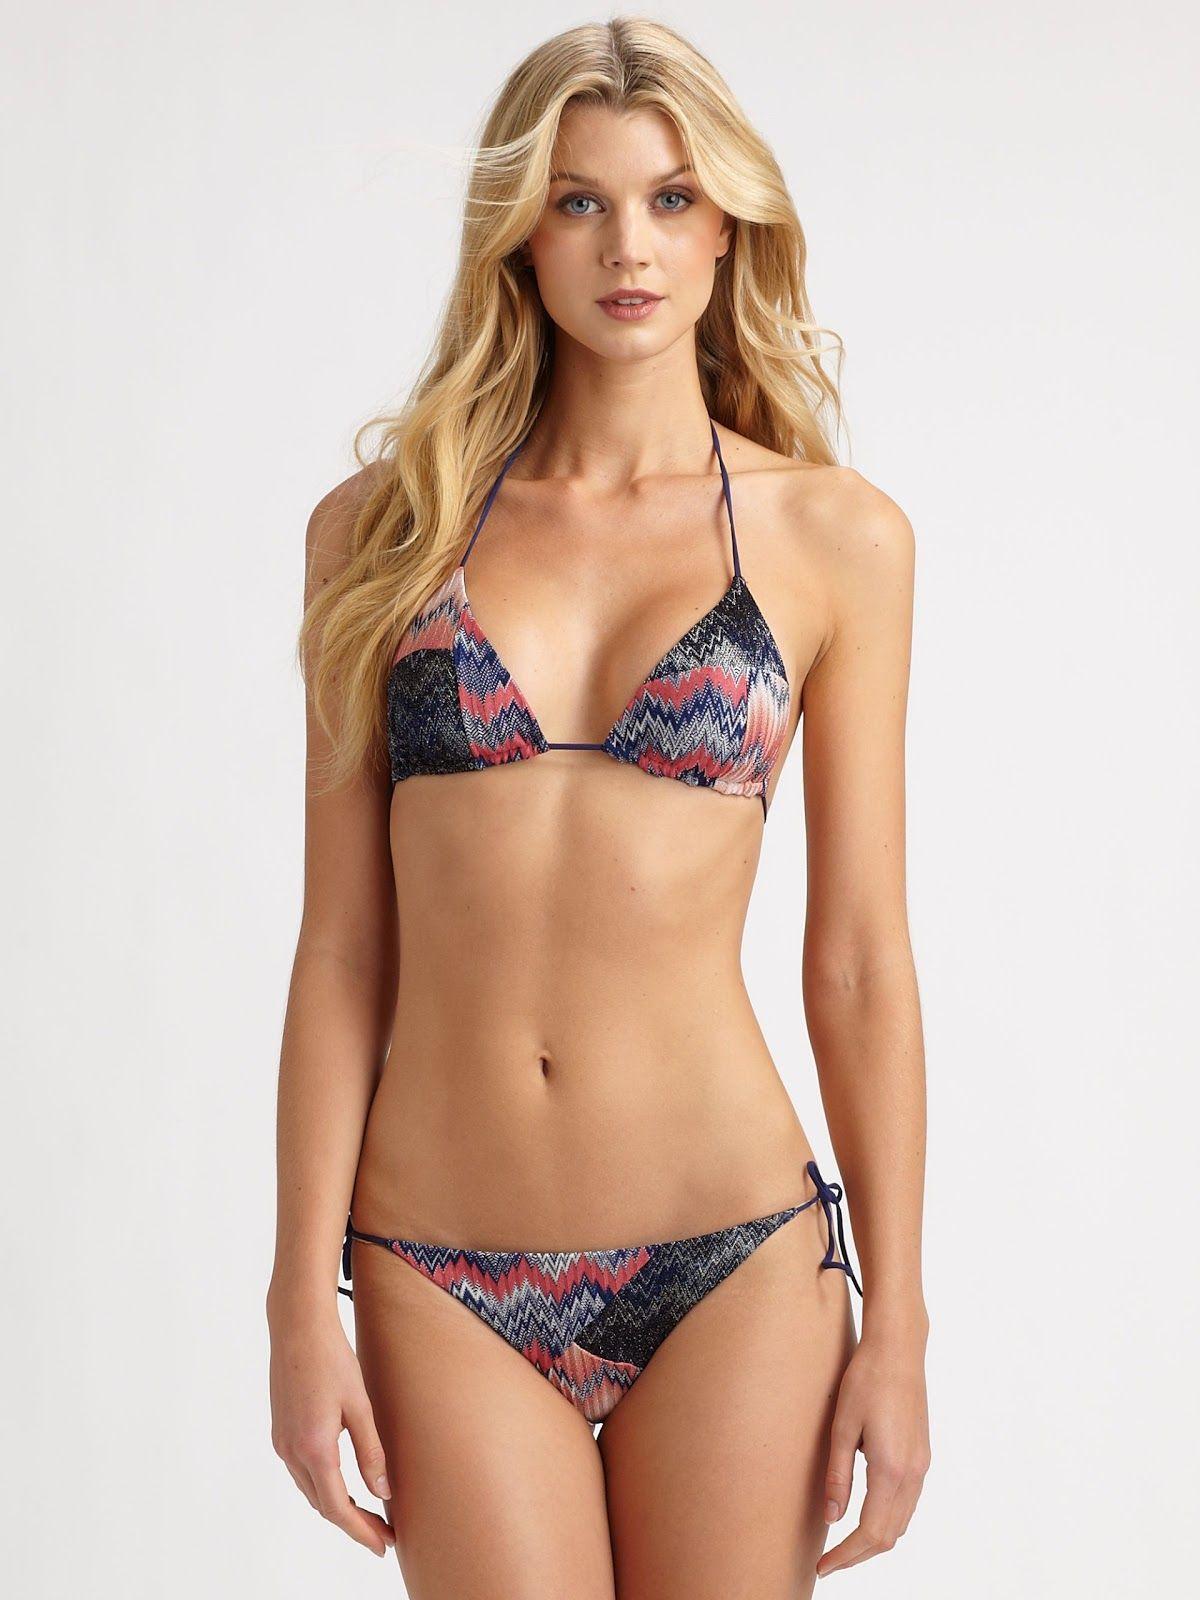 Bikini Luna Rival nude (66 photos), Topless, Hot, Instagram, swimsuit 2006